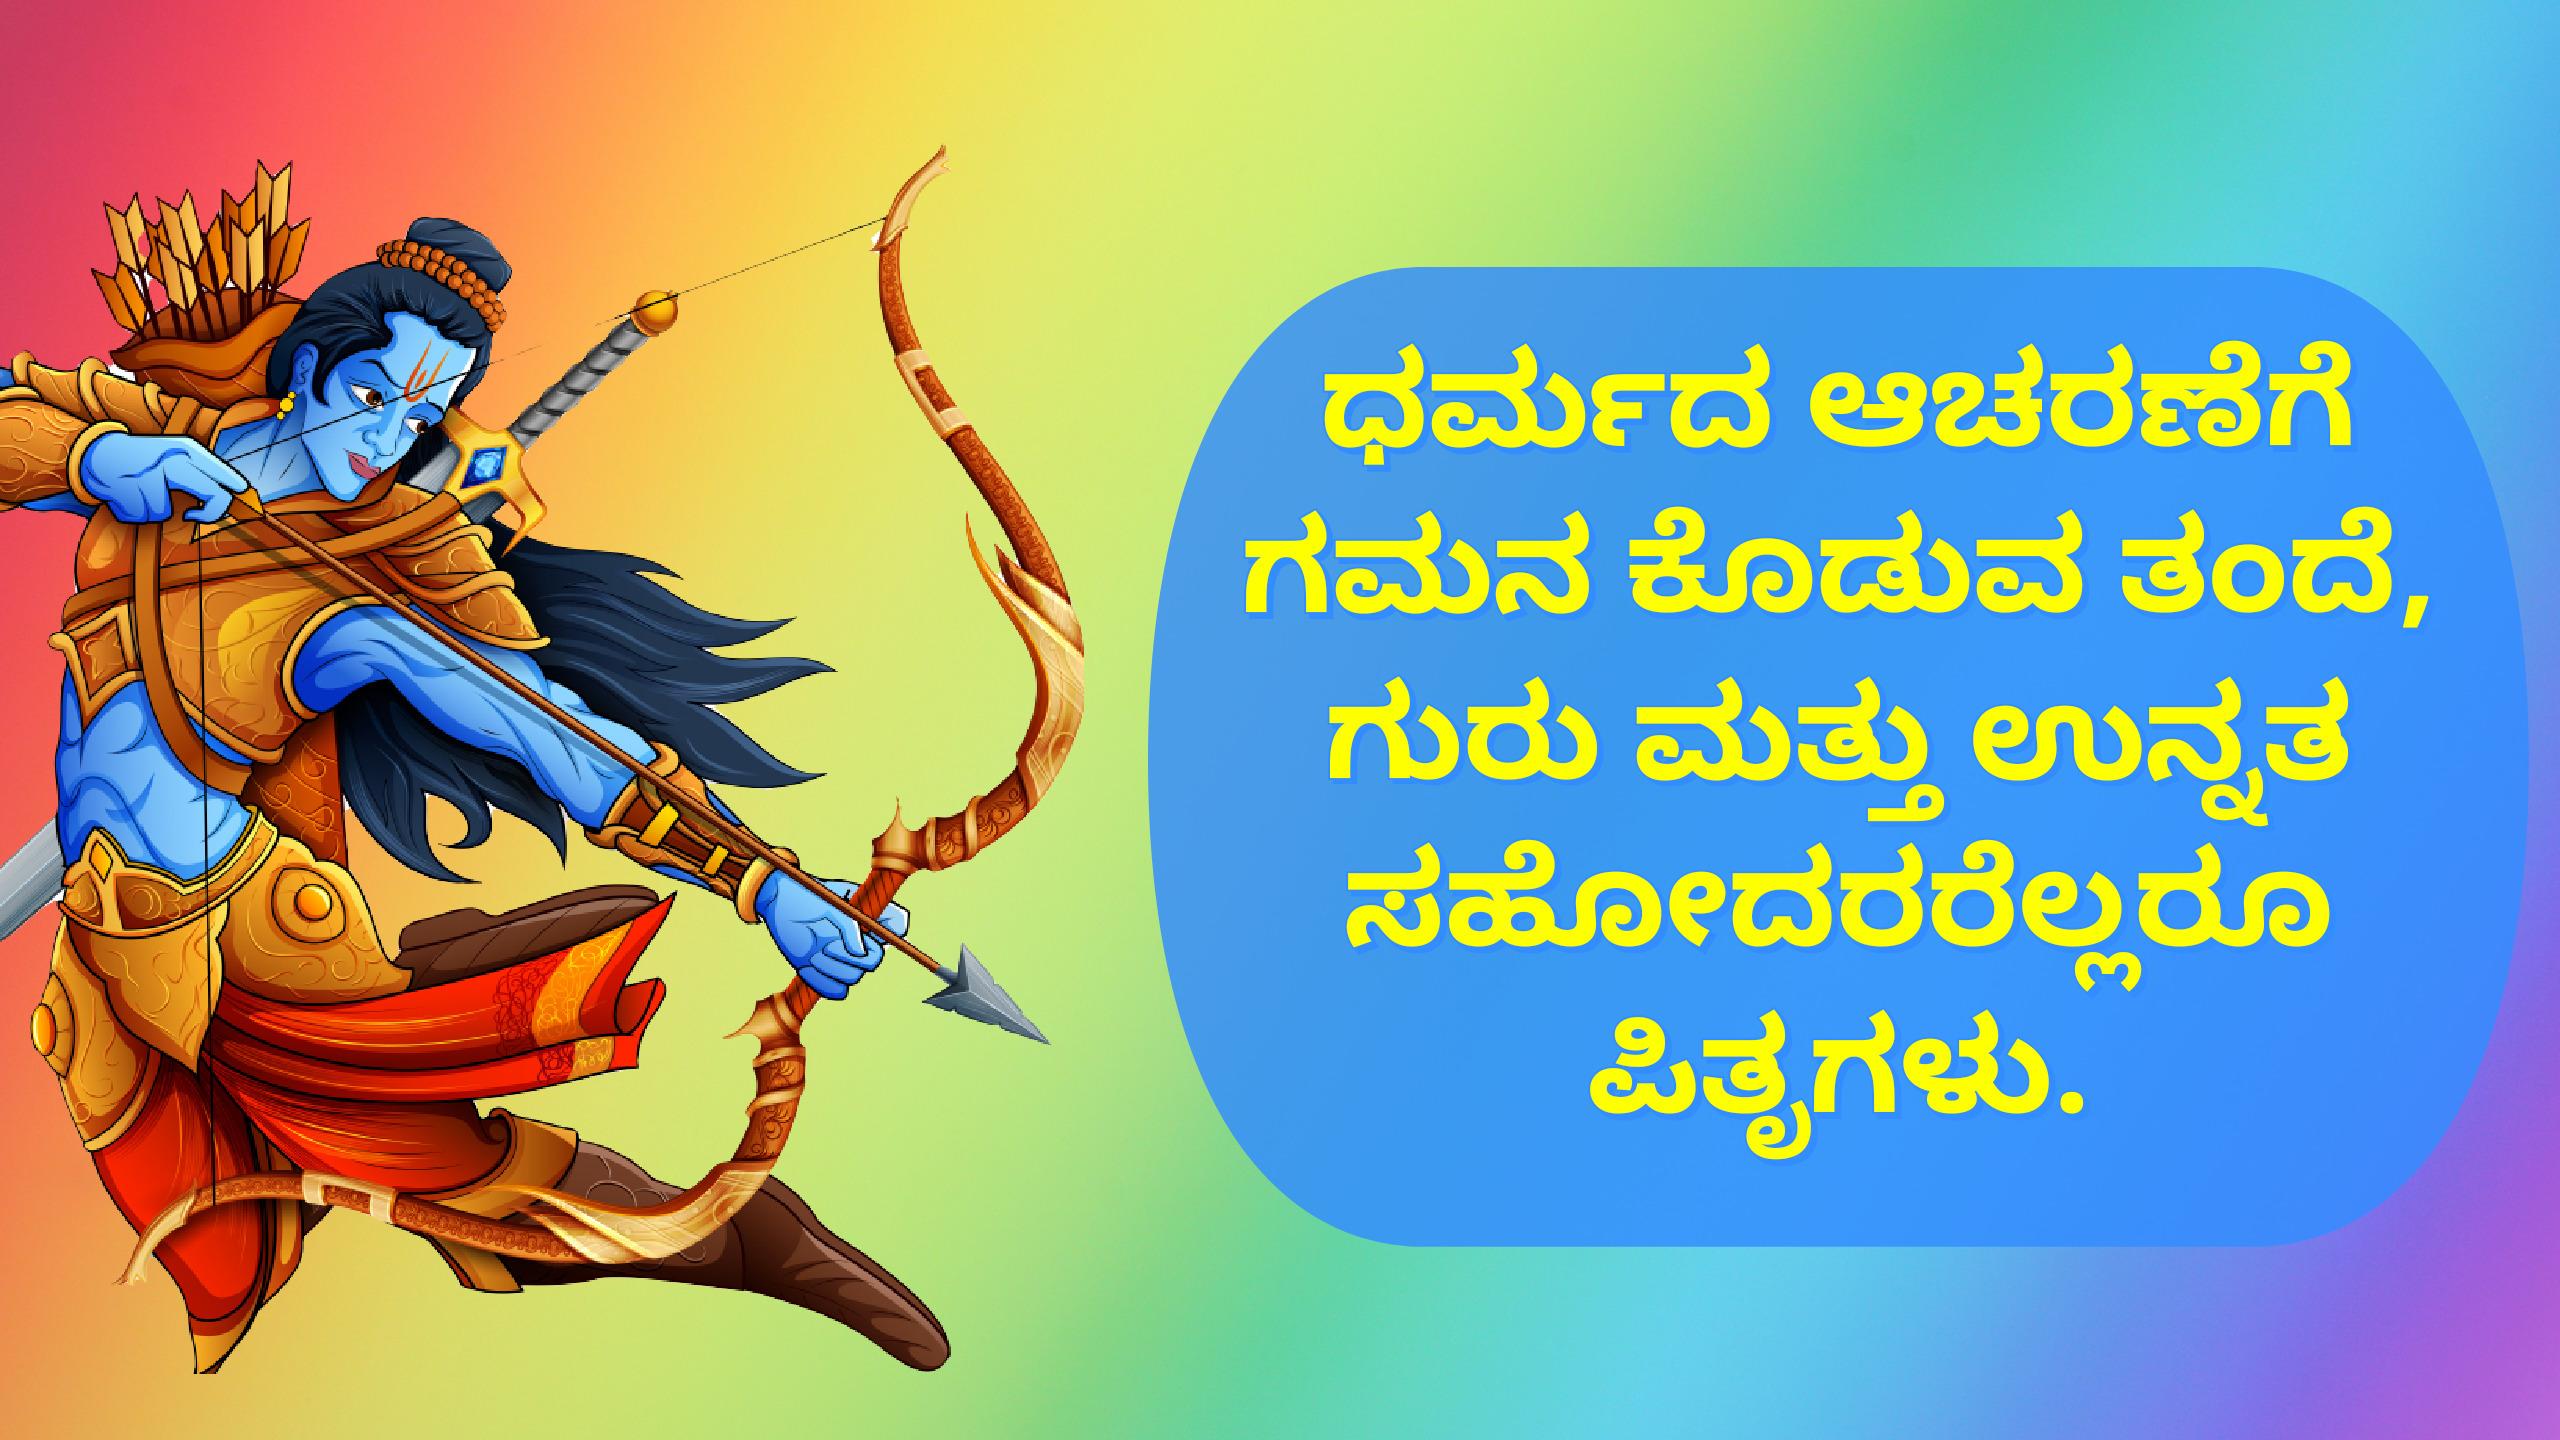 18. Shree Ram Quotes in Kannada